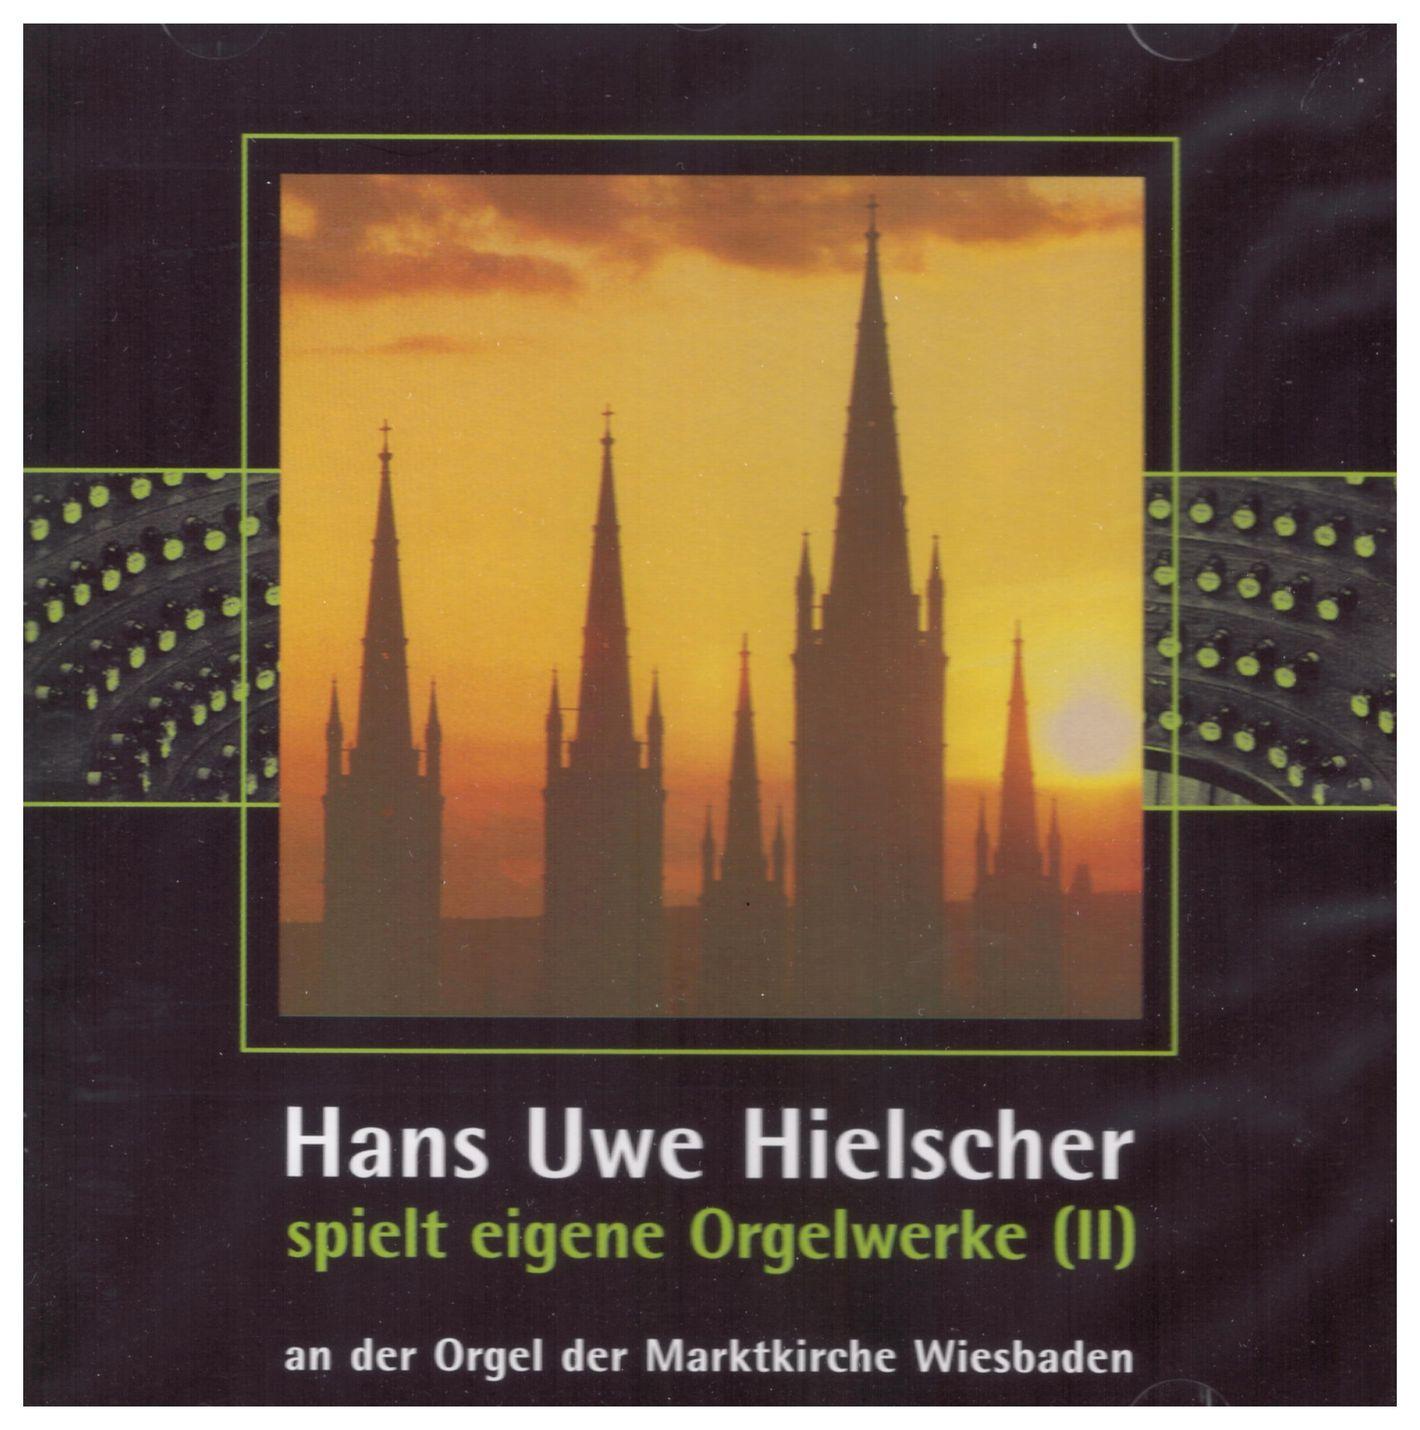 Hans Uwe Hielscher plays own organ works, Vol. II